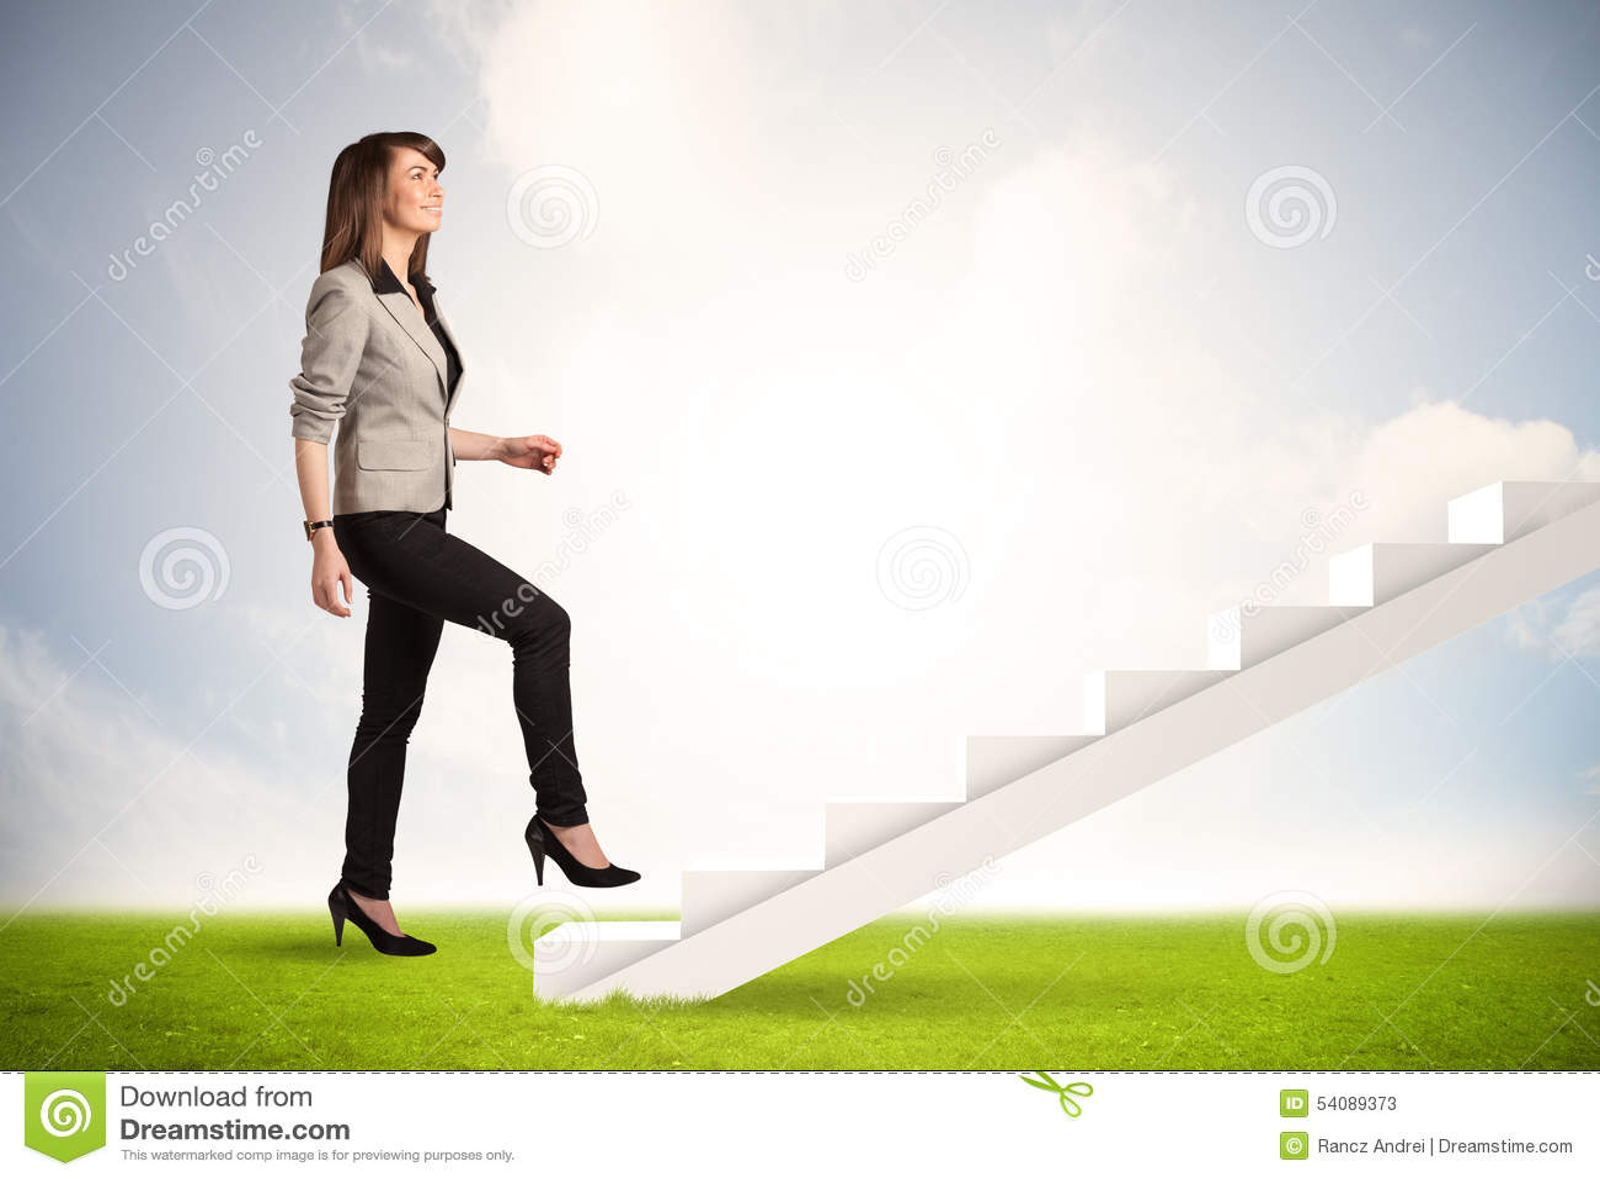 Bedrijfspersoon die omhoog op witte trap in aard beklimmen